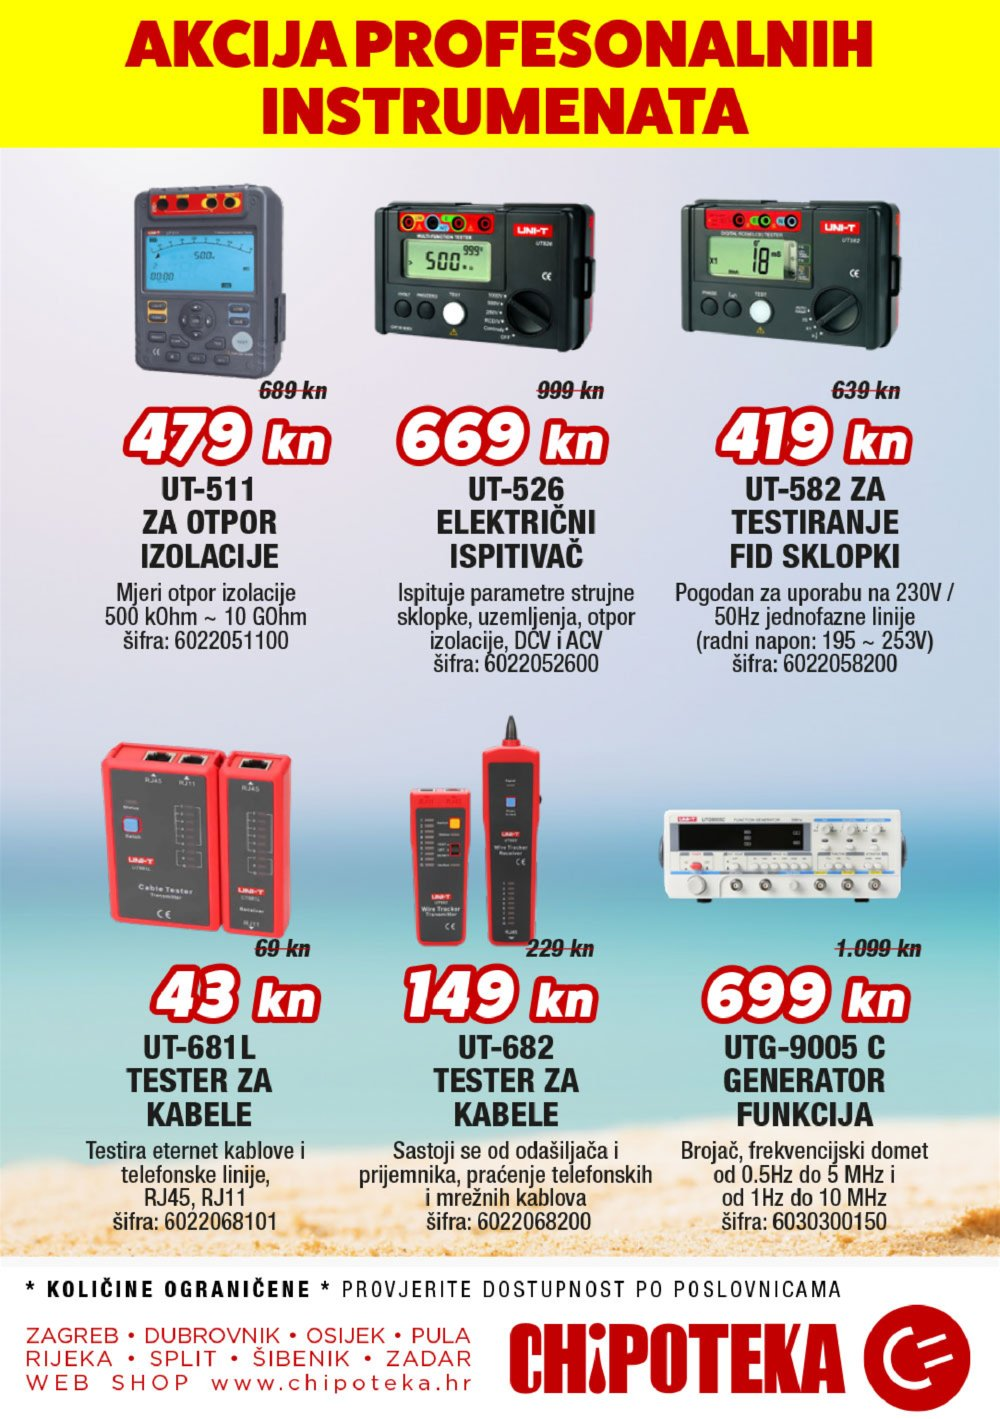 Chipoteka katalog Akcija 06.07.-06.08.2018.